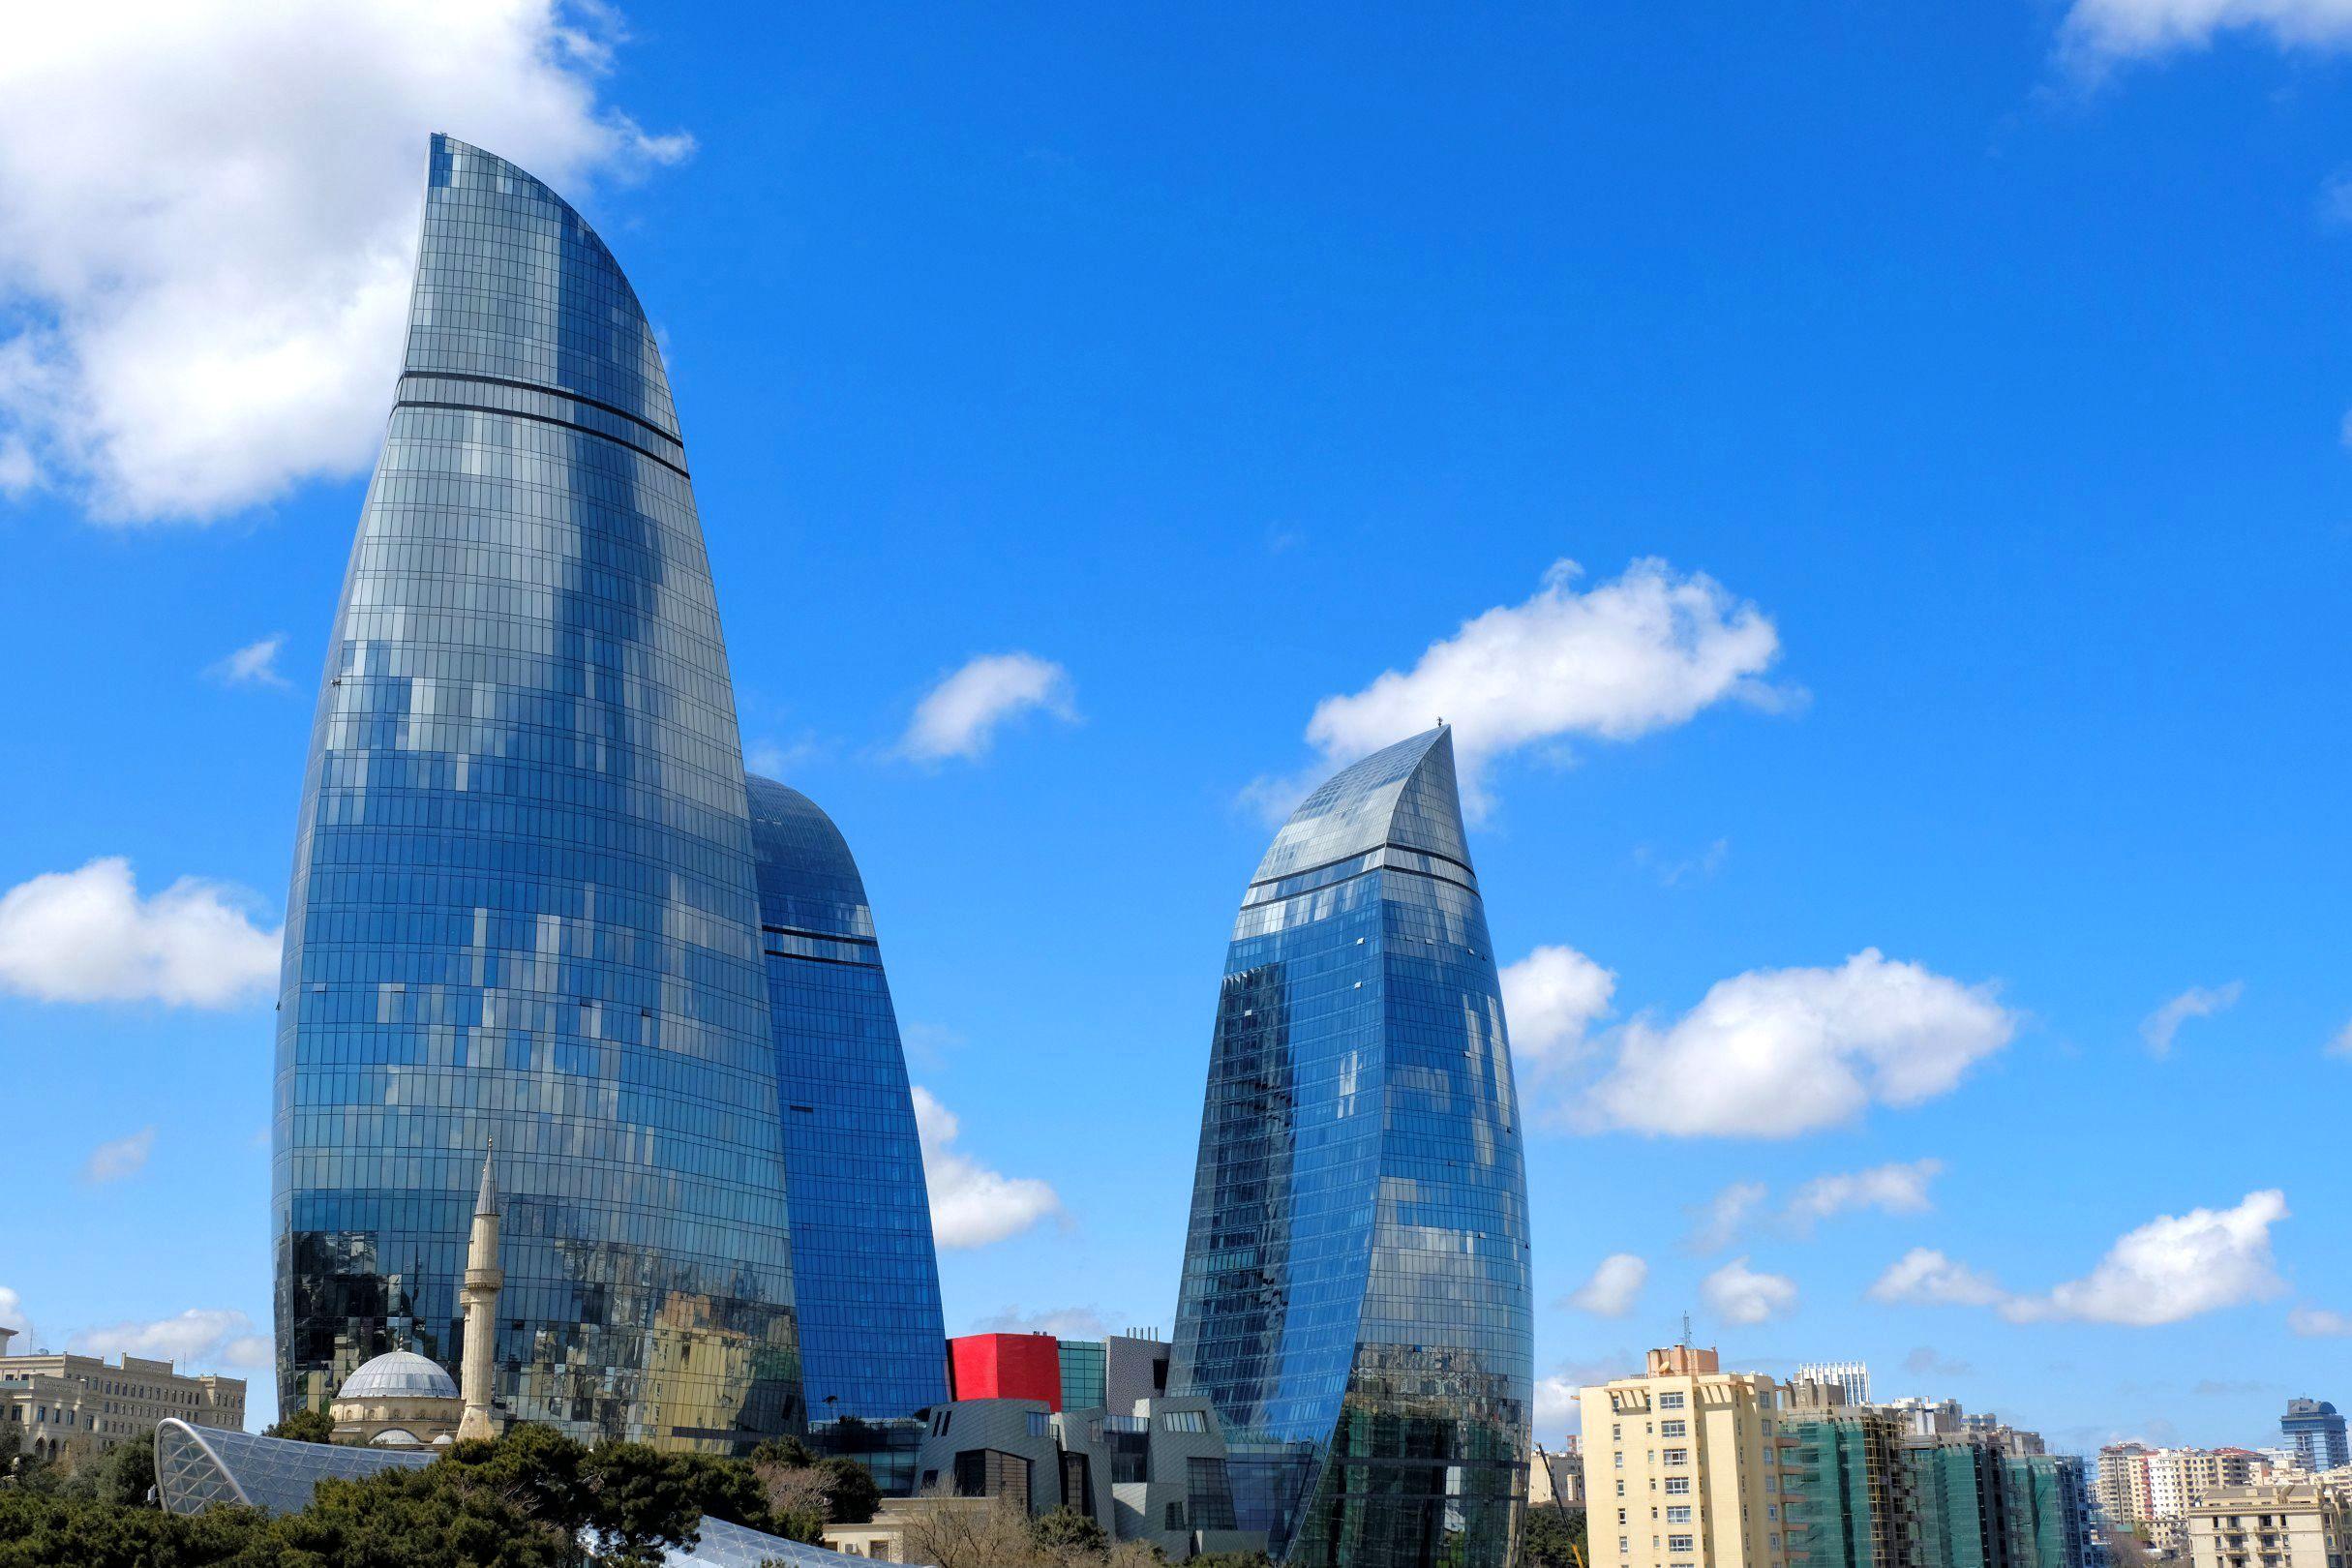 Baku Flame Towers